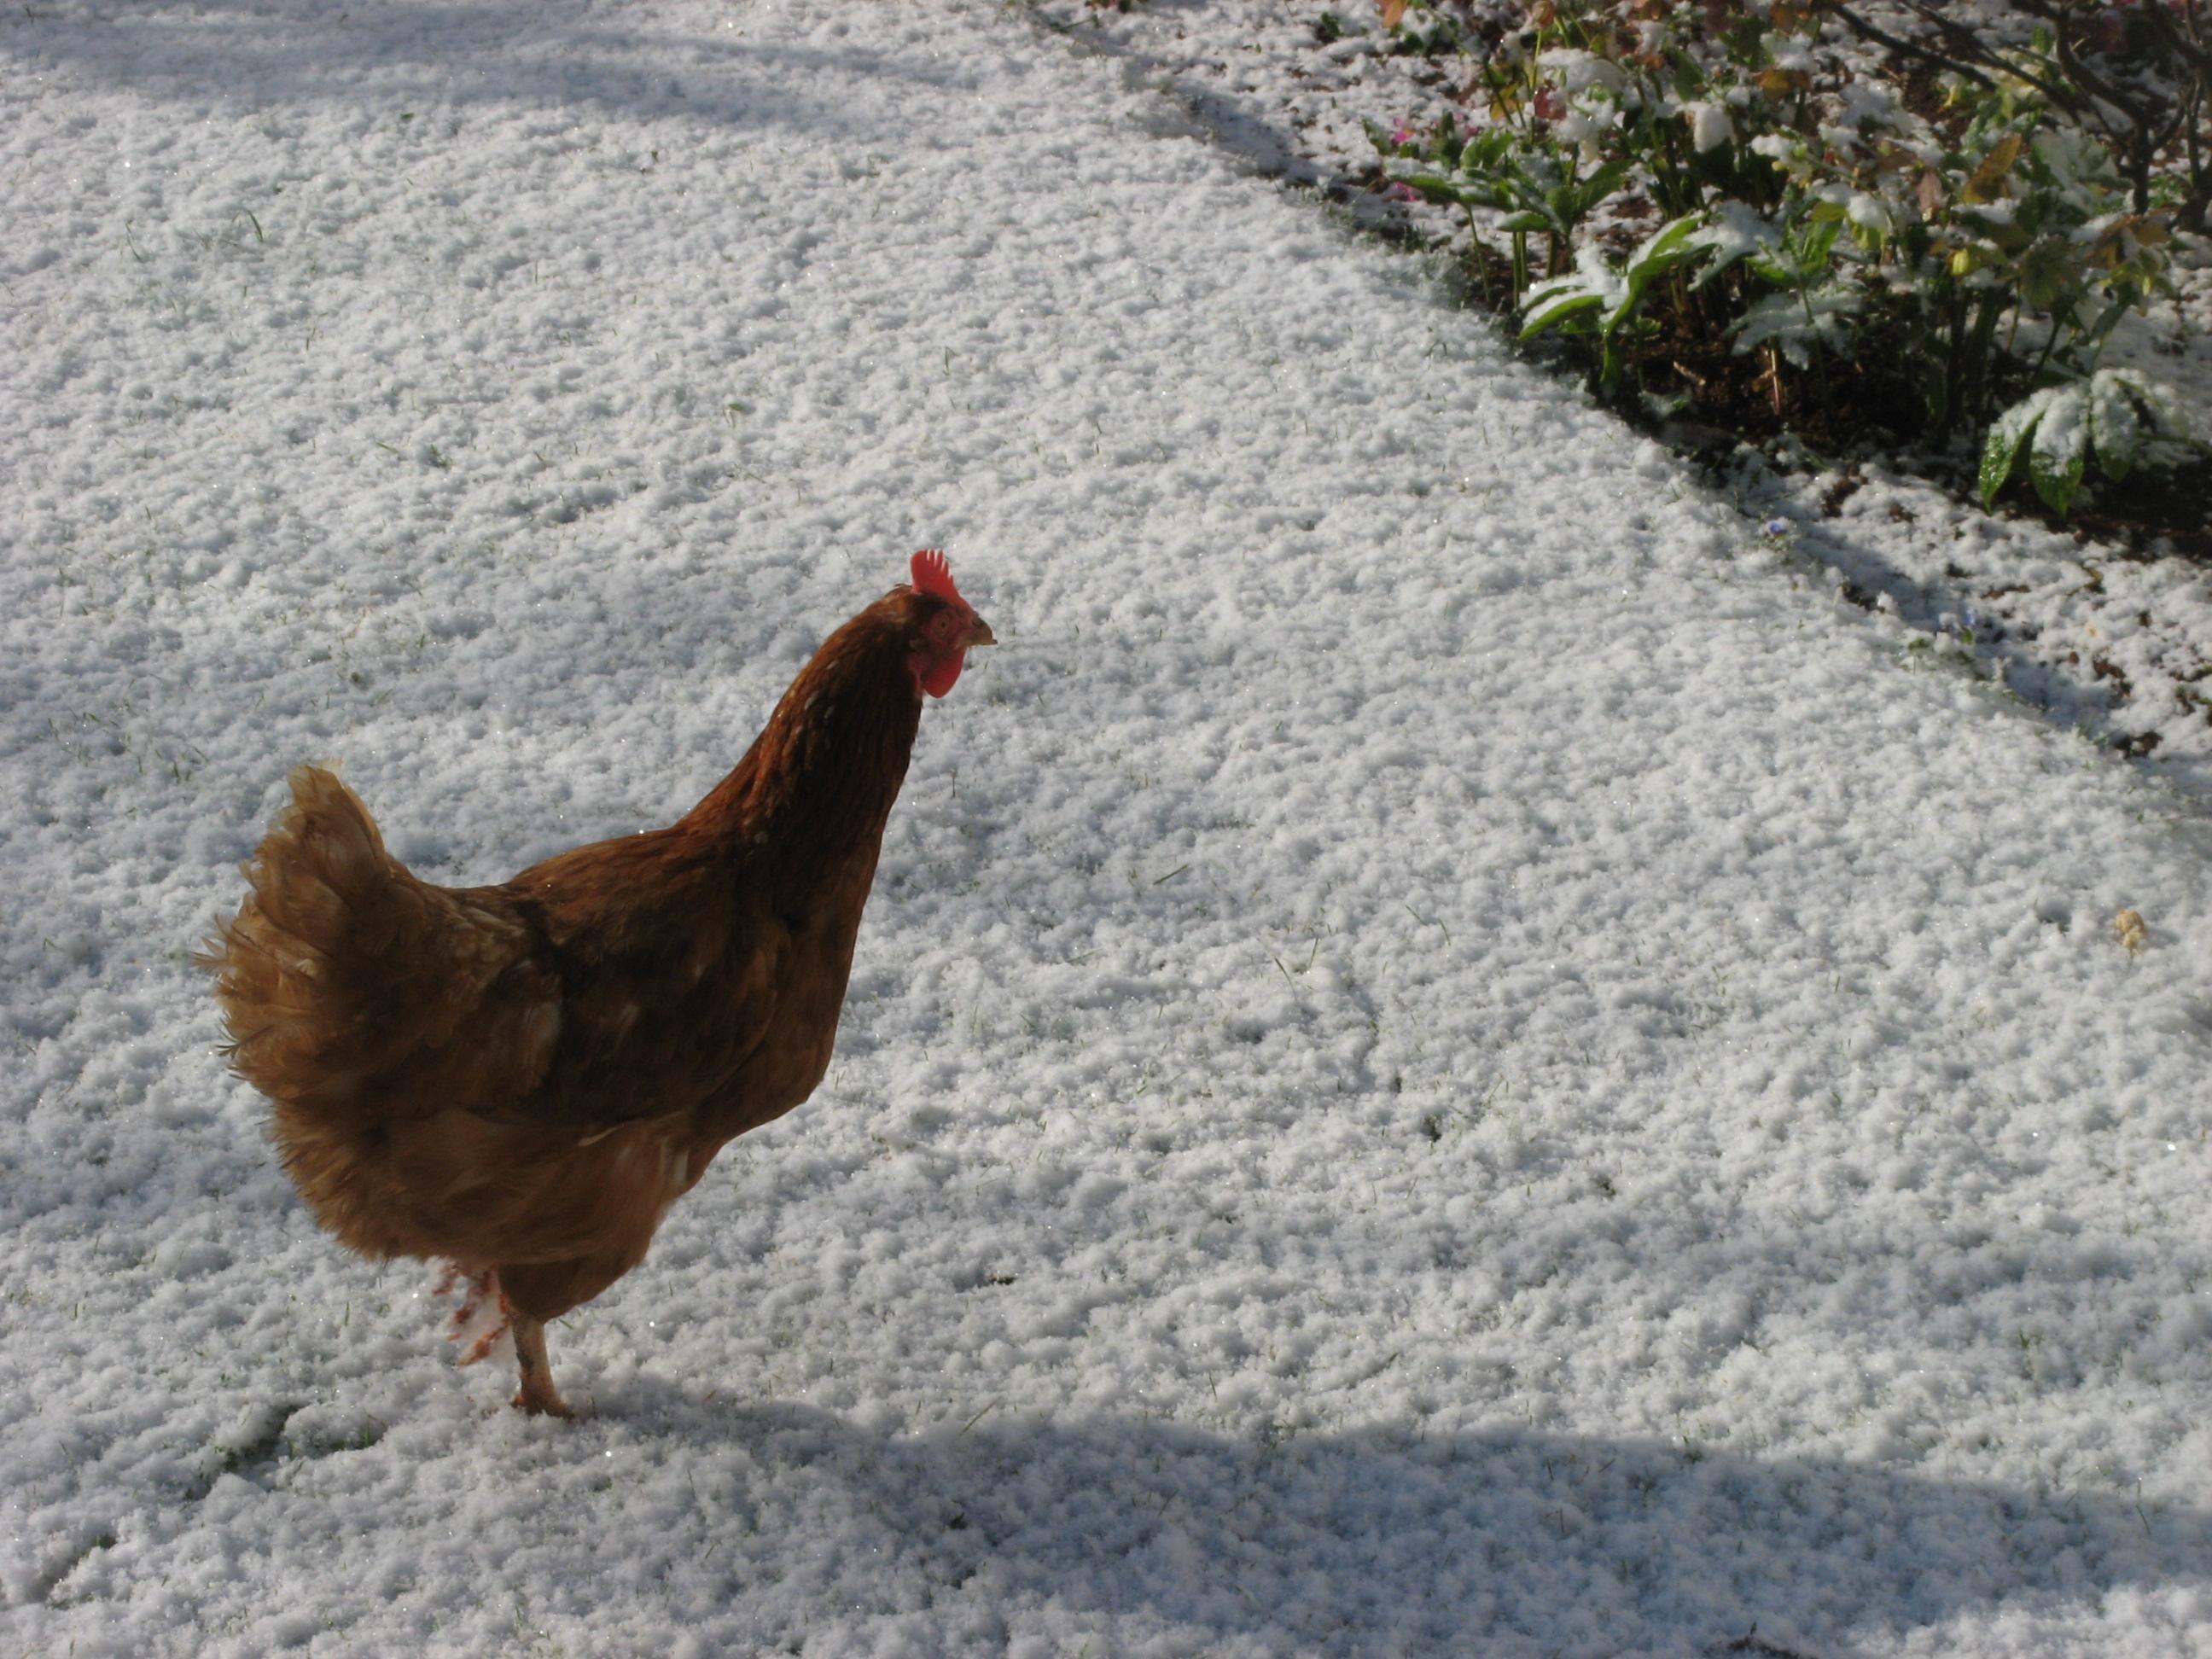 detroit chickens ferndale chickens